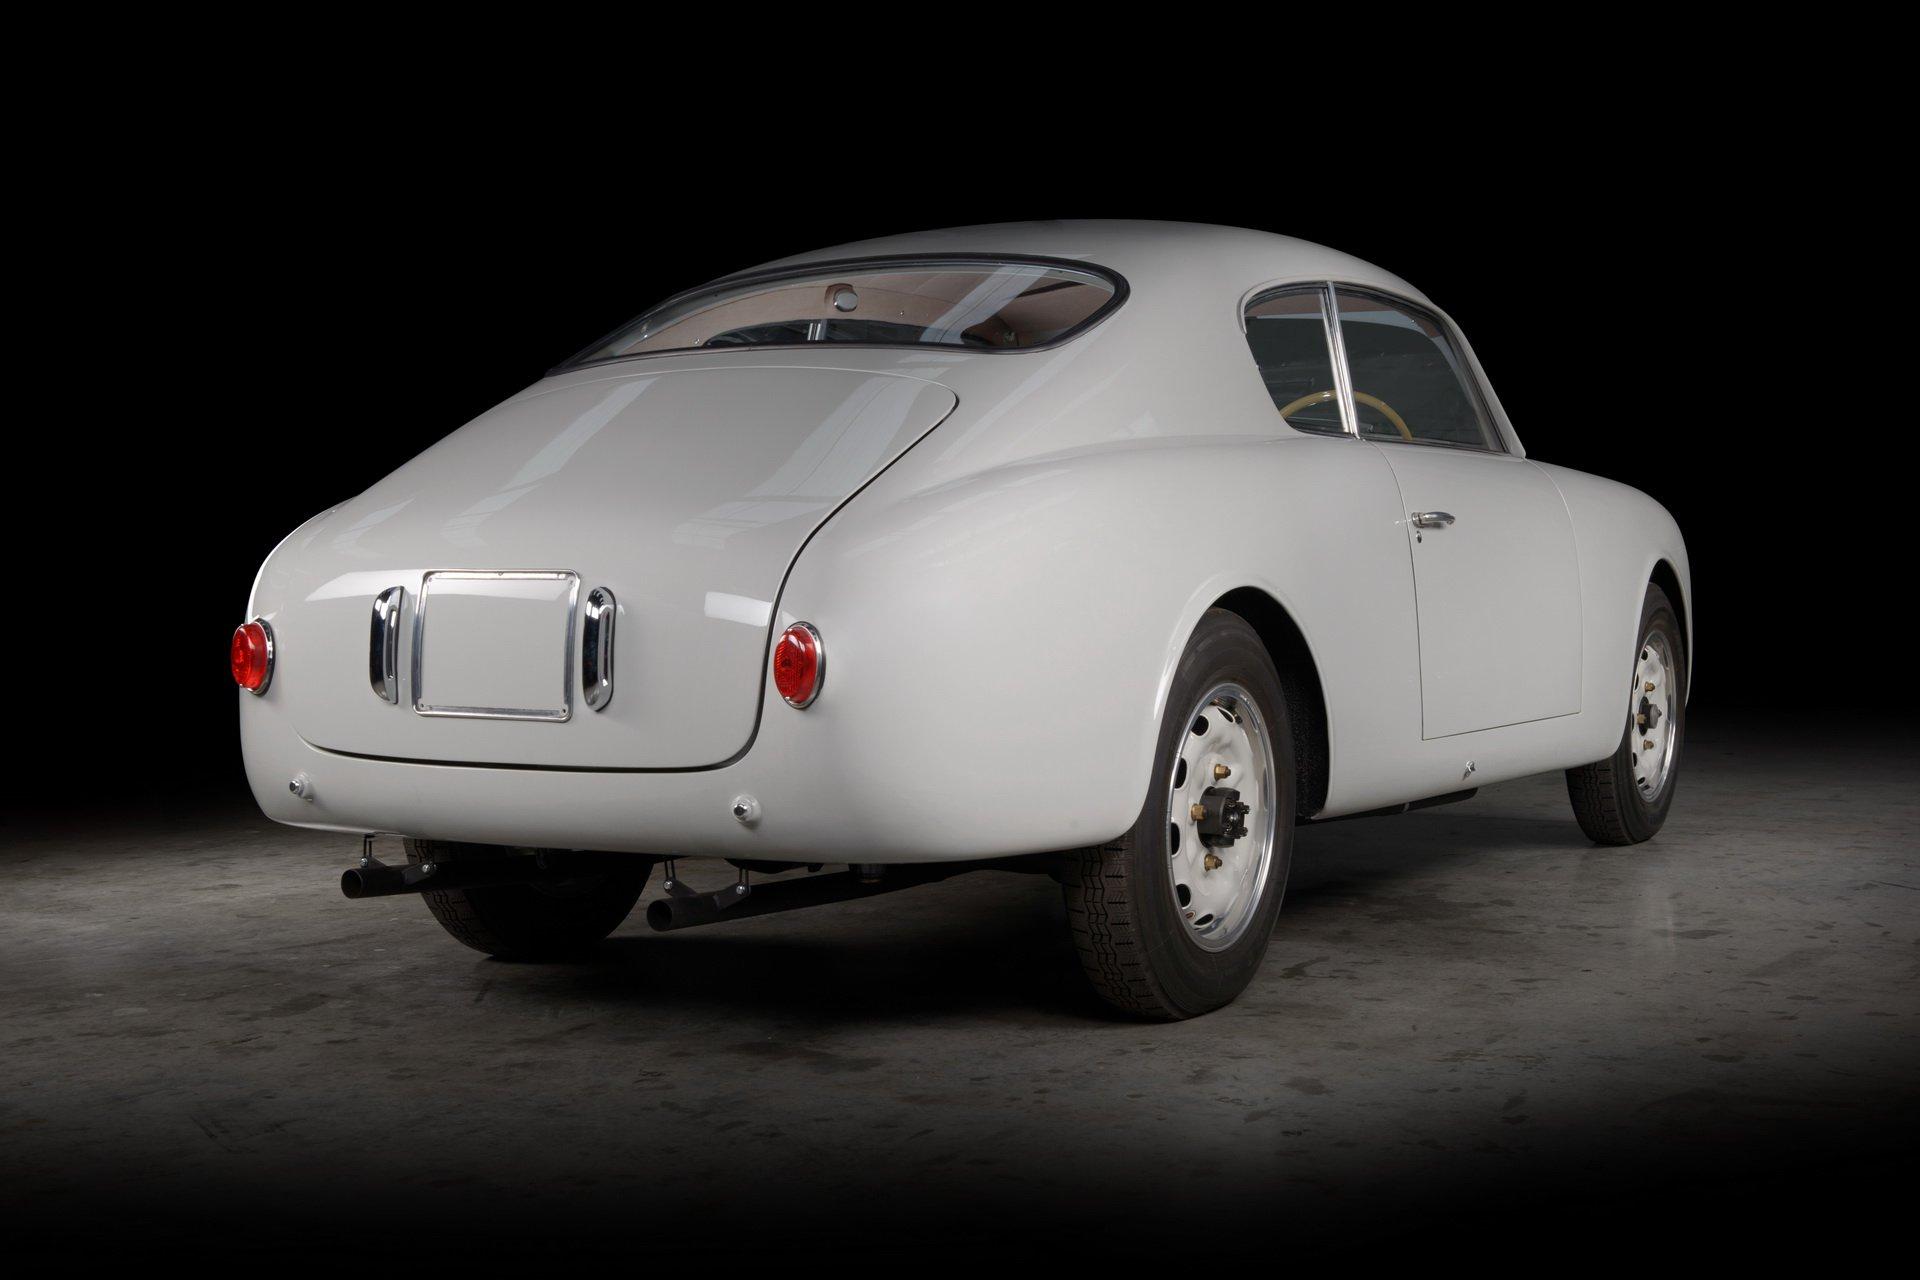 Lancia-Aurelia-B20-GT-restored-7